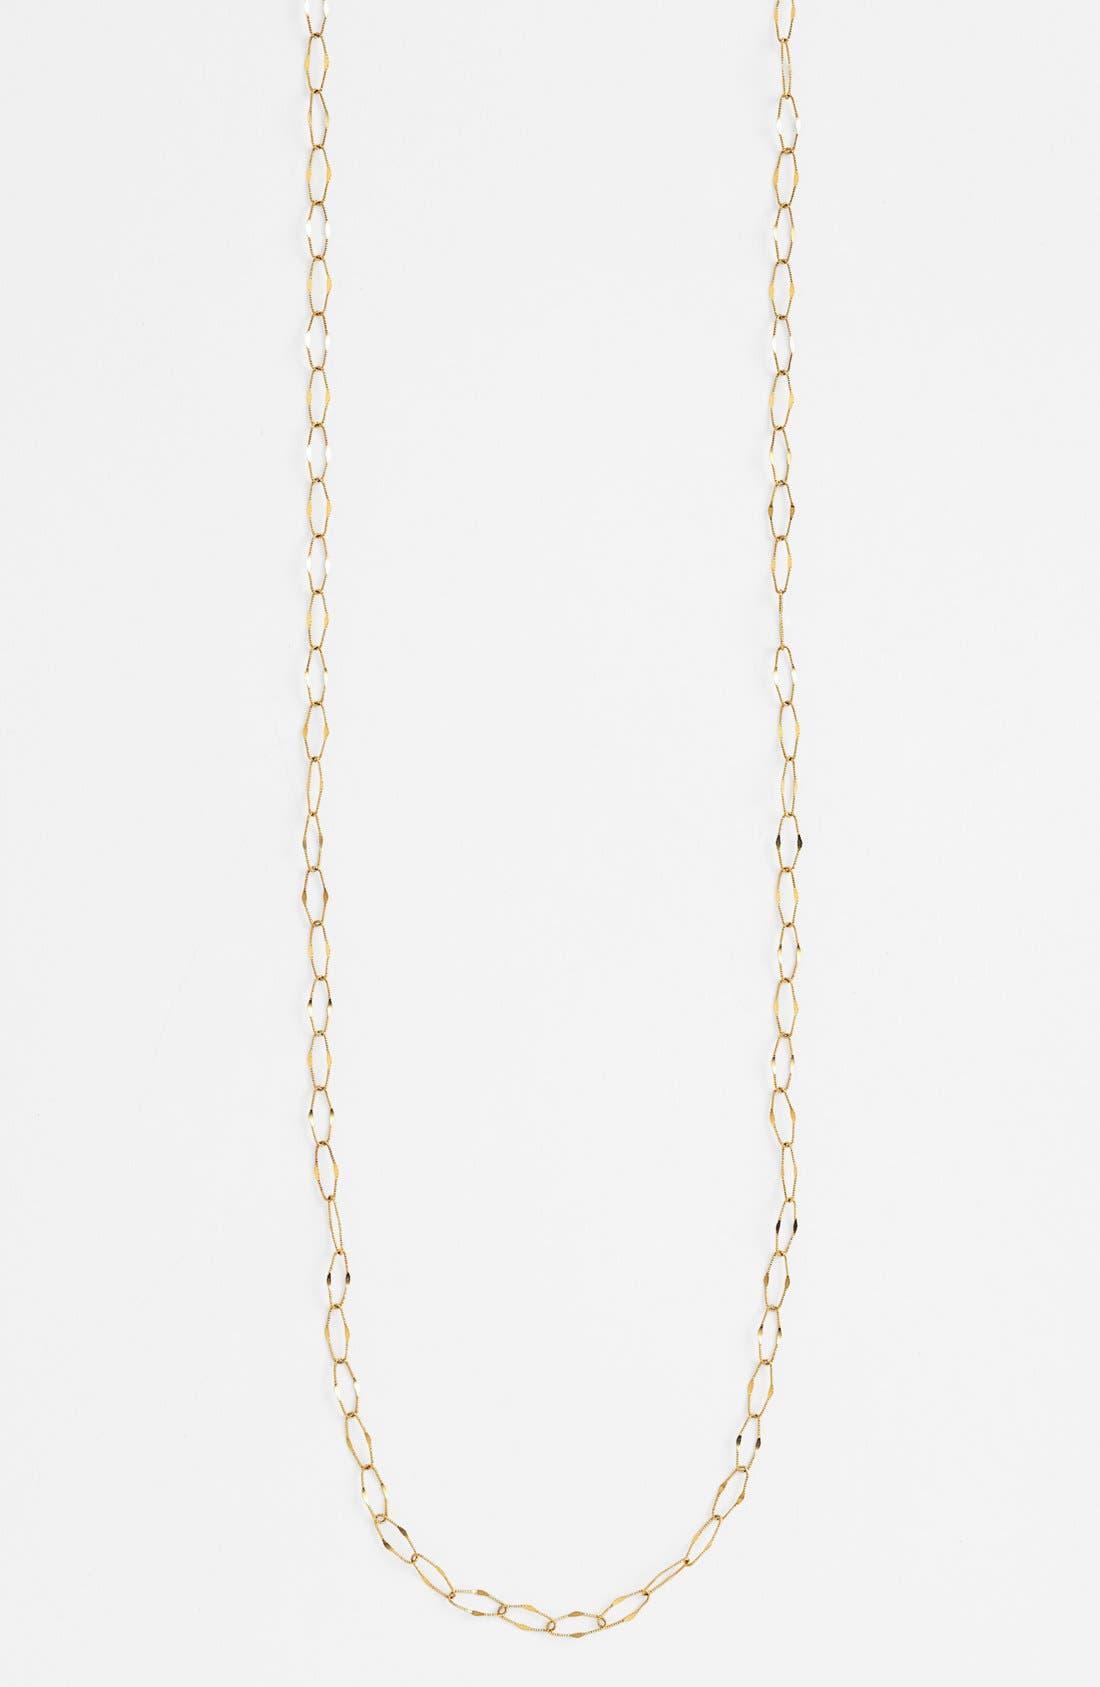 Alternate Image 1 Selected - Lana Jewelry 'Spellbound - Single Drama' Long Necklace